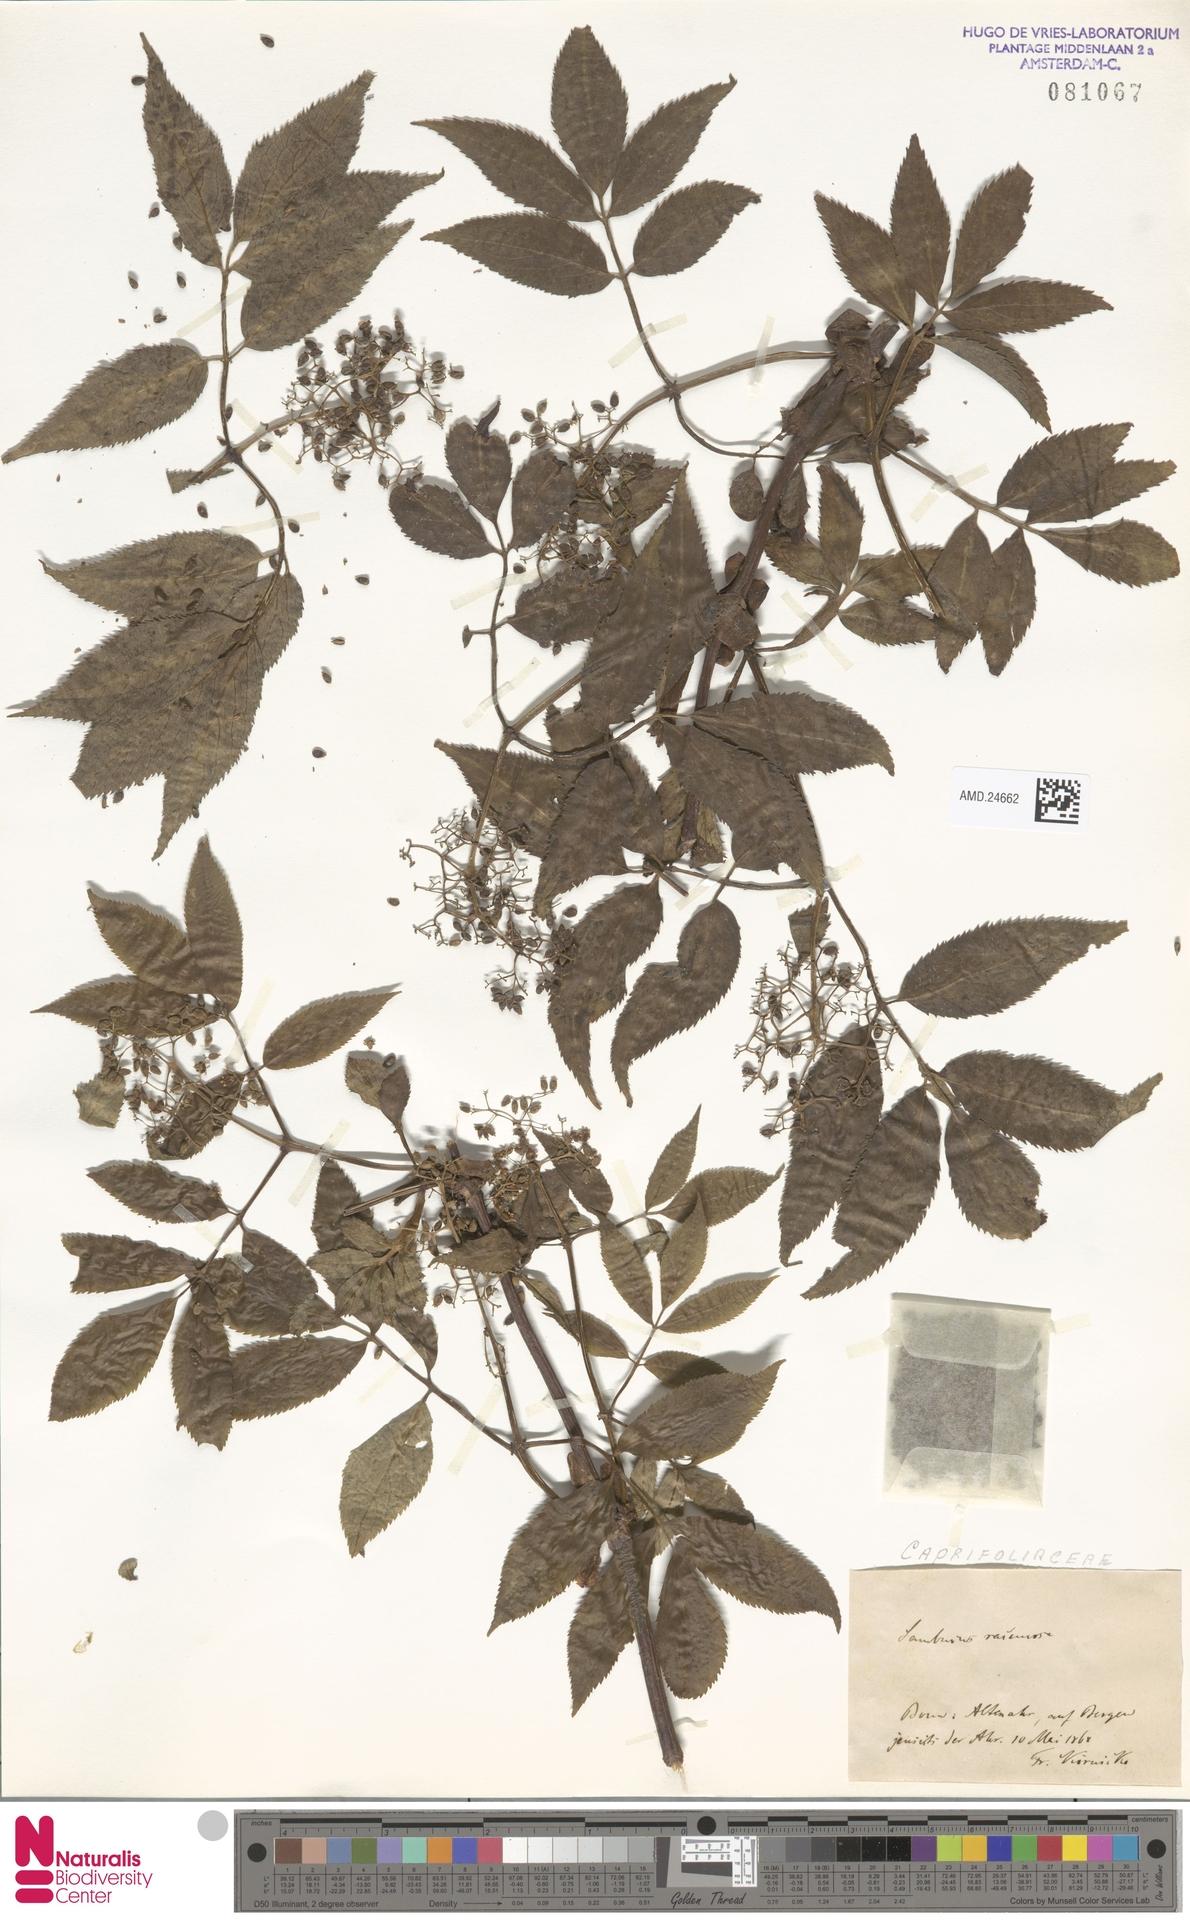 AMD.24662 | Sambucus racemosa L.